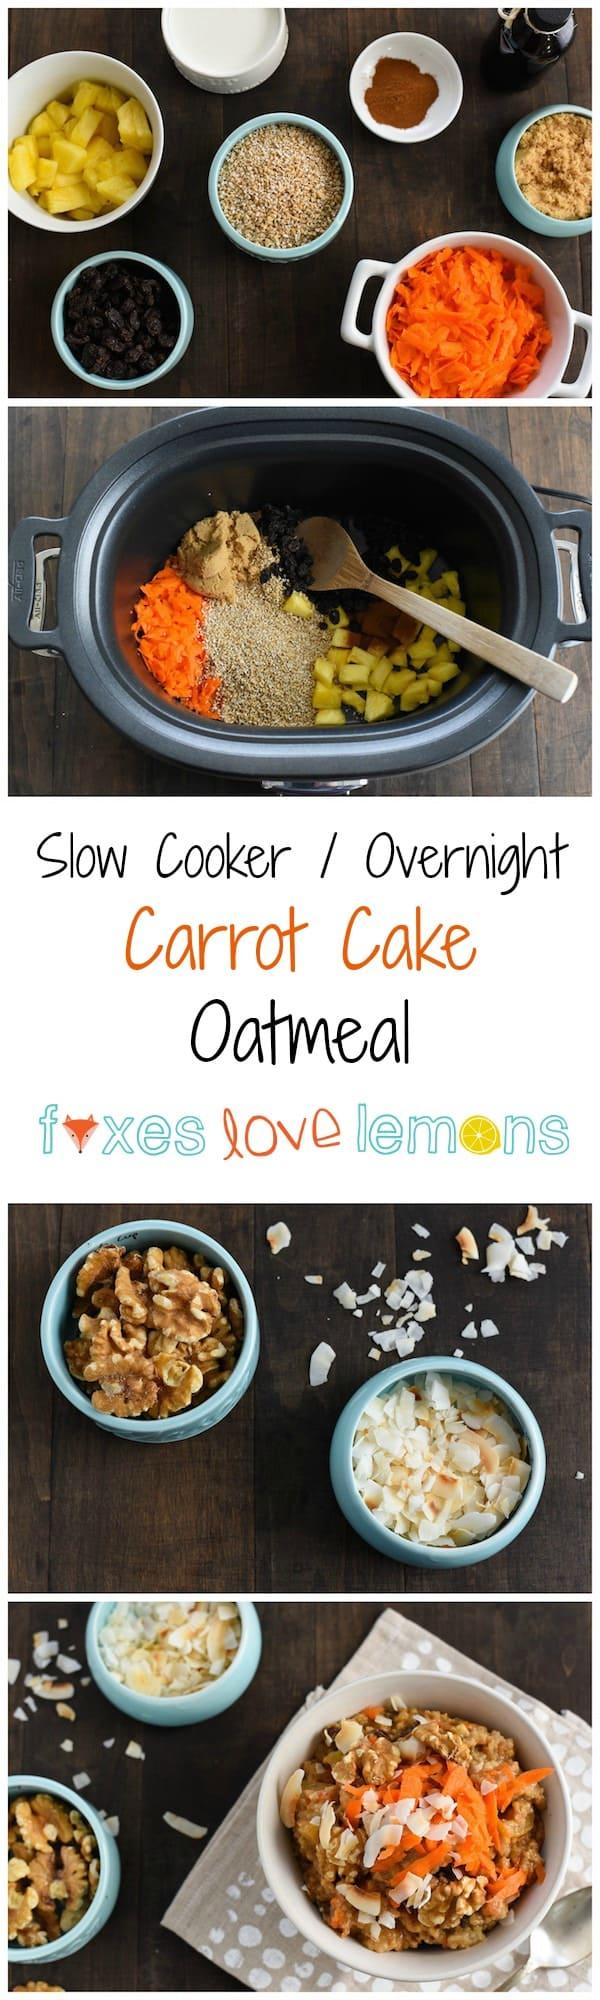 Slow Cooker Carrot Cake Oatmeal Recipe